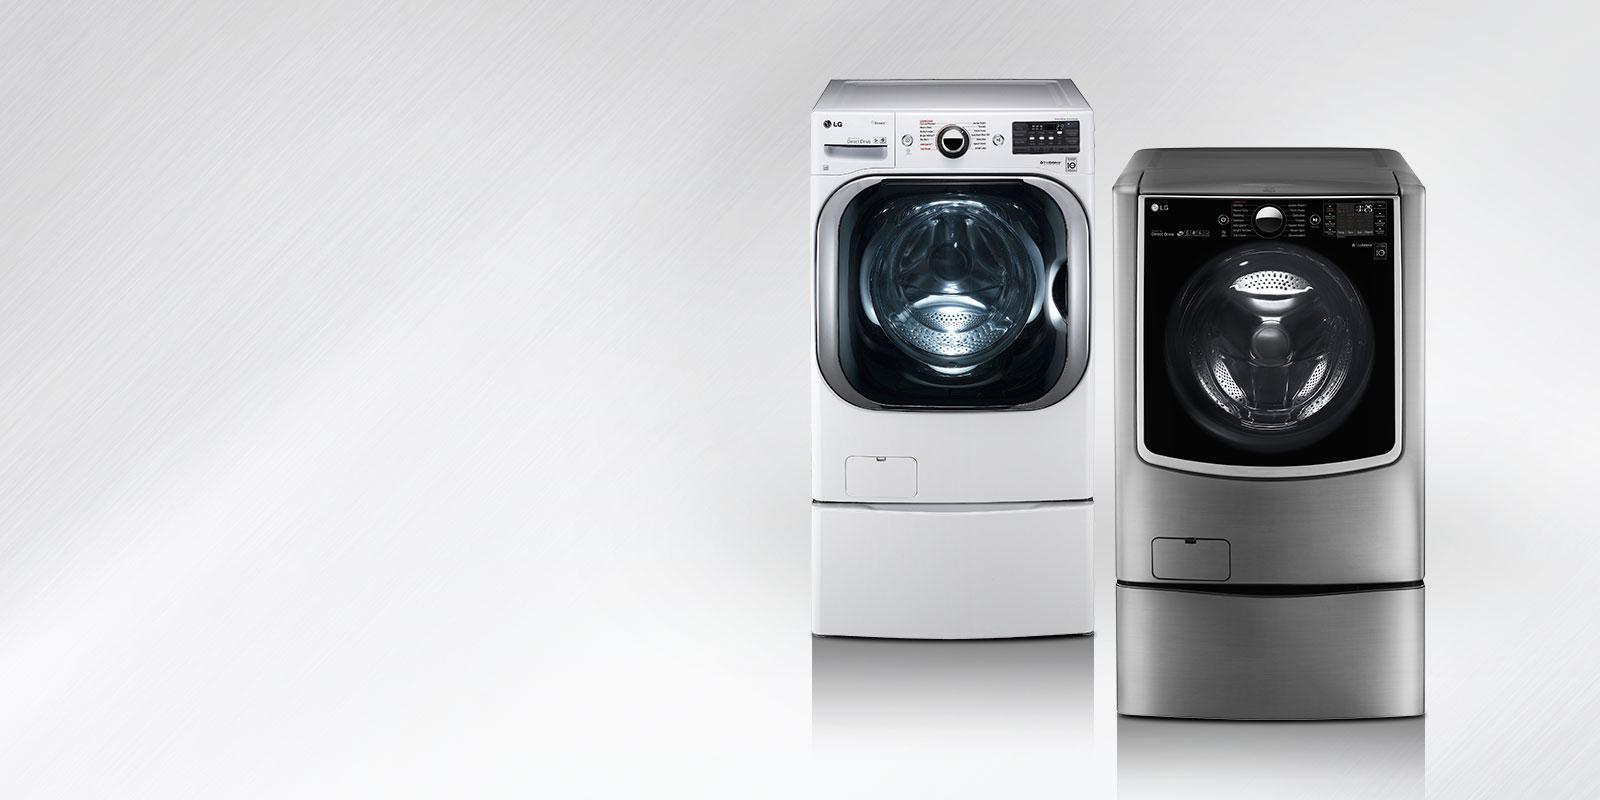 How Big Is A Washing Machine Lg Washers Innovative Washing Machine Solutions Lg Usa